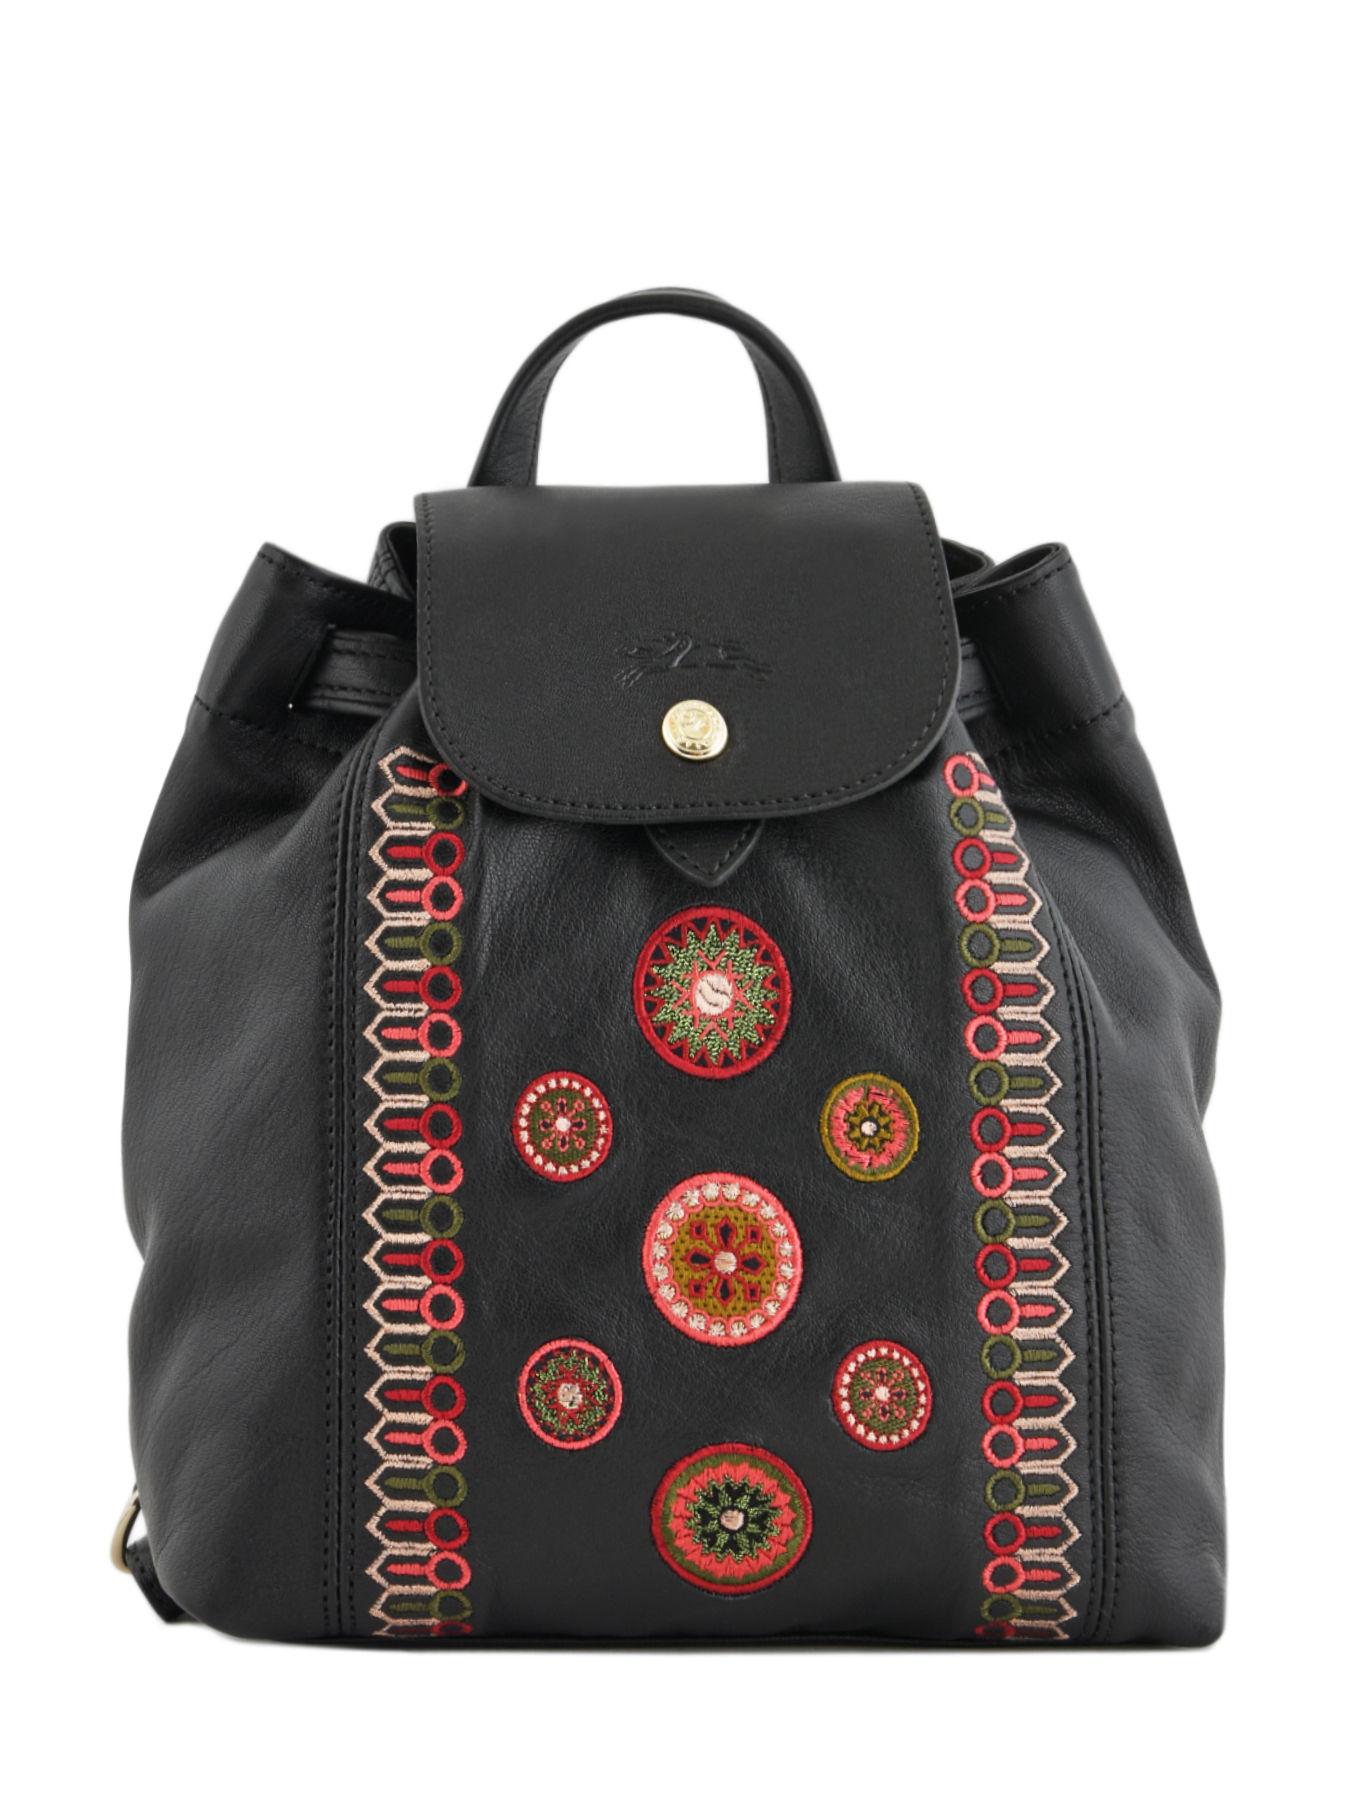 ... Longchamp Le pliage cuir rosace Backpack Black ... 7edea3e76345a